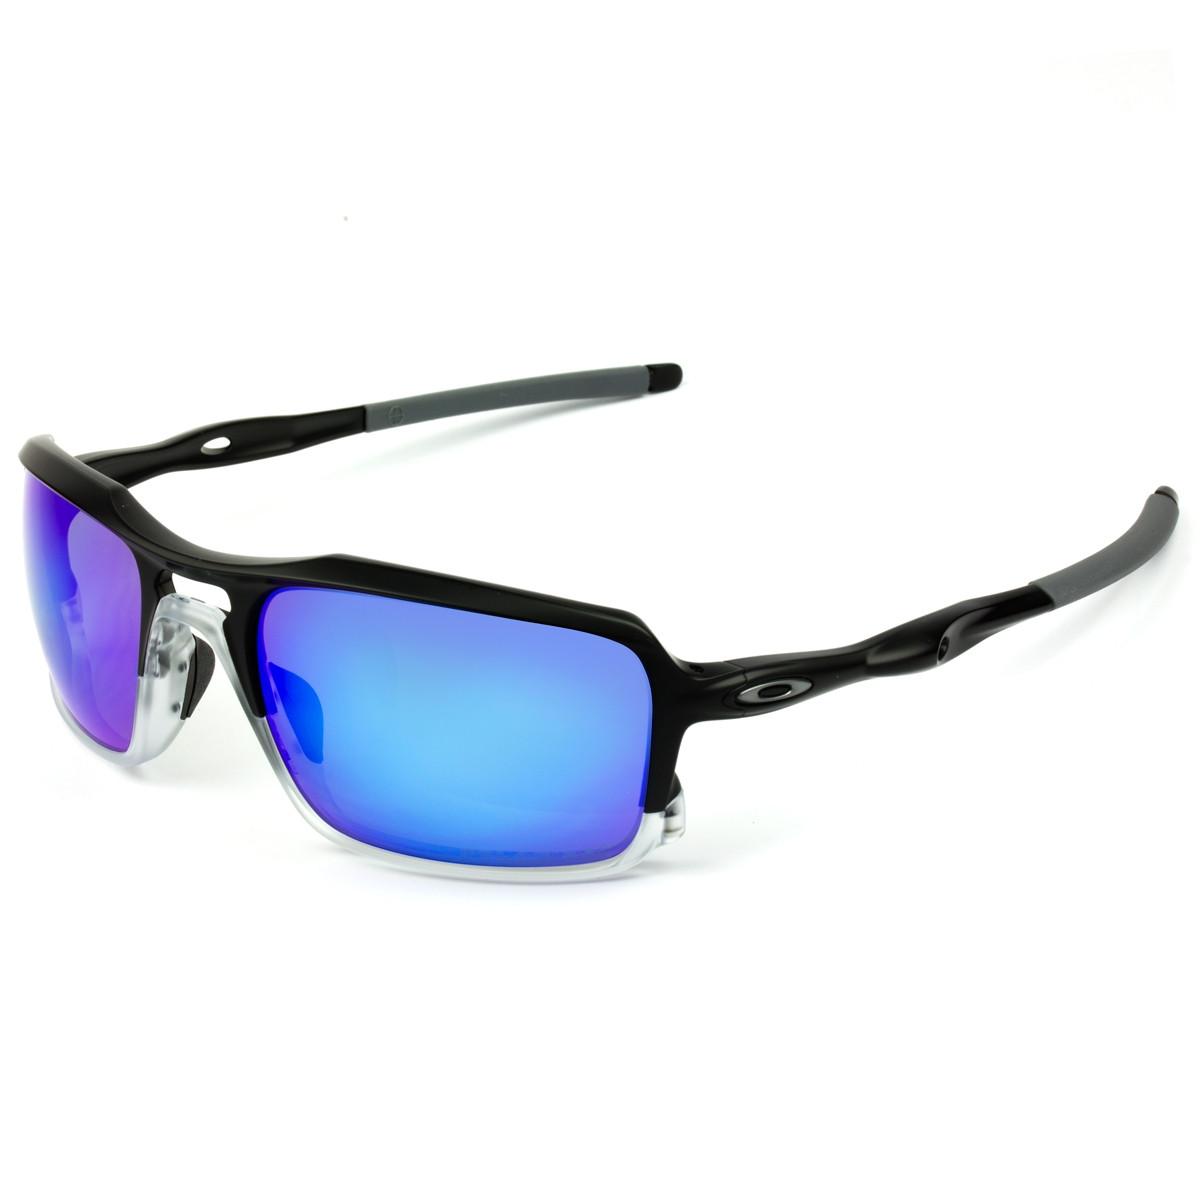 Óculos Oakley Triggerman Matte Black Lente Sapphire Iridium Polarizado 1369d8c6e1